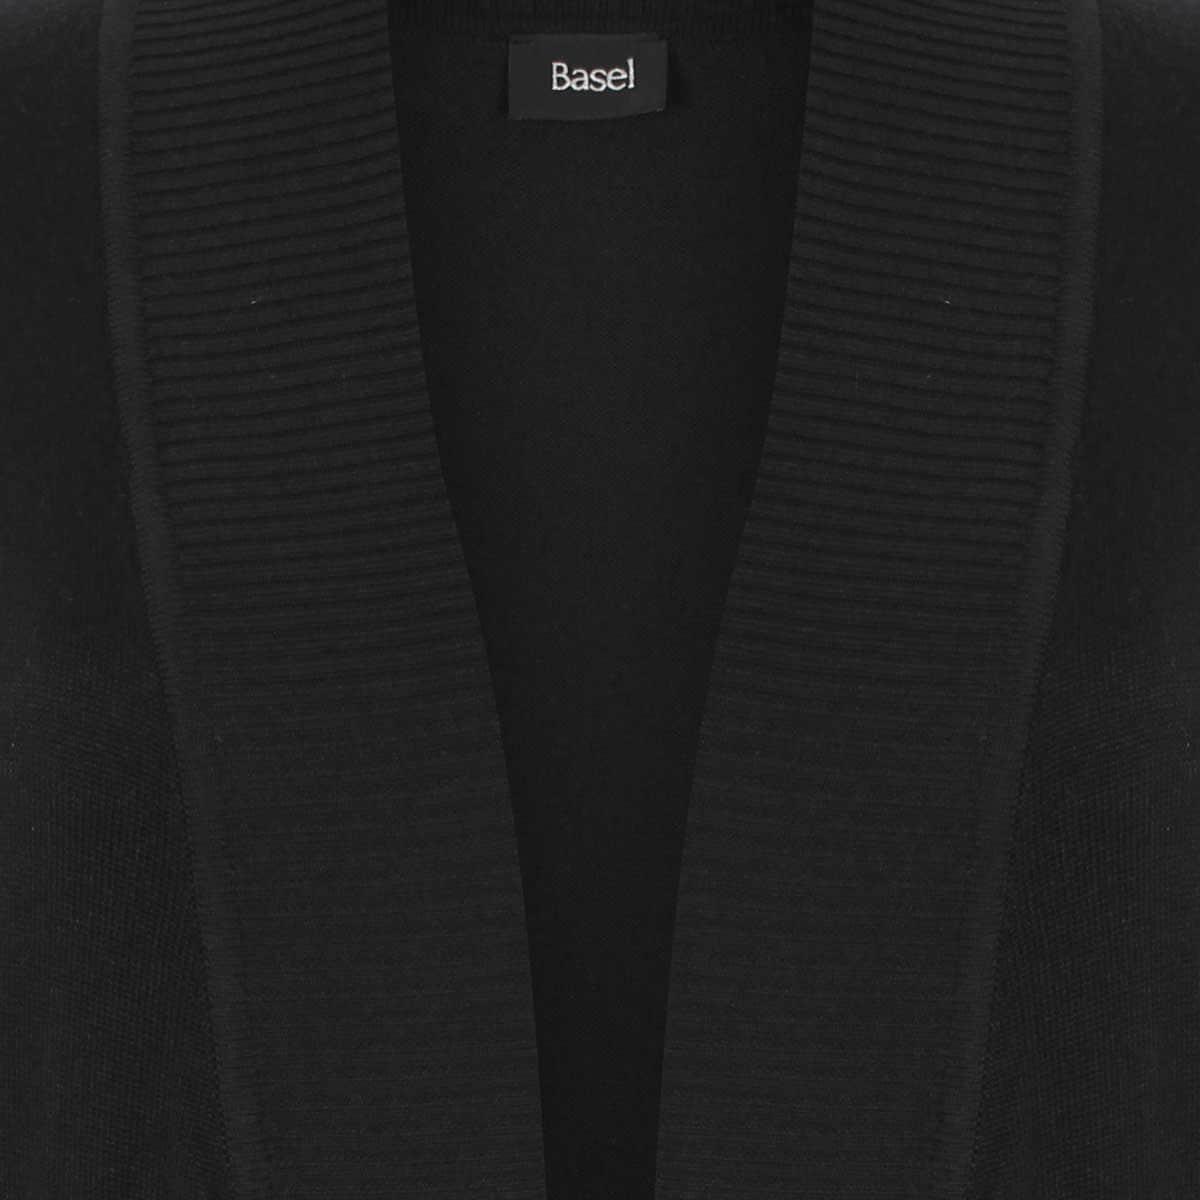 Suéter Negro Abierto Manga Larga con Perlas Liso Basel